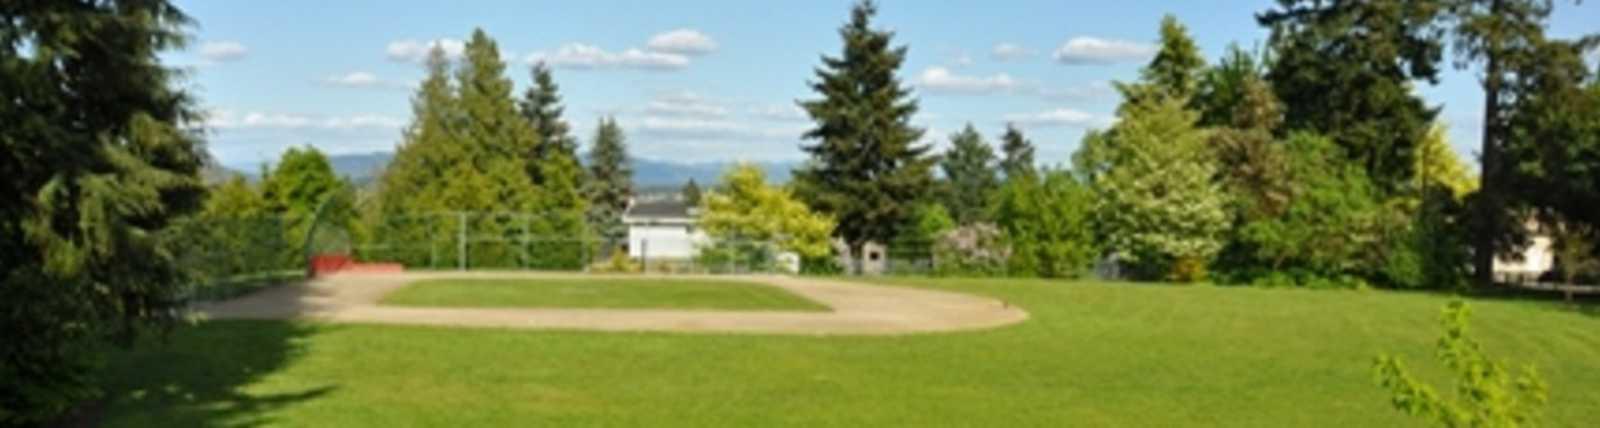 Tukwila Park